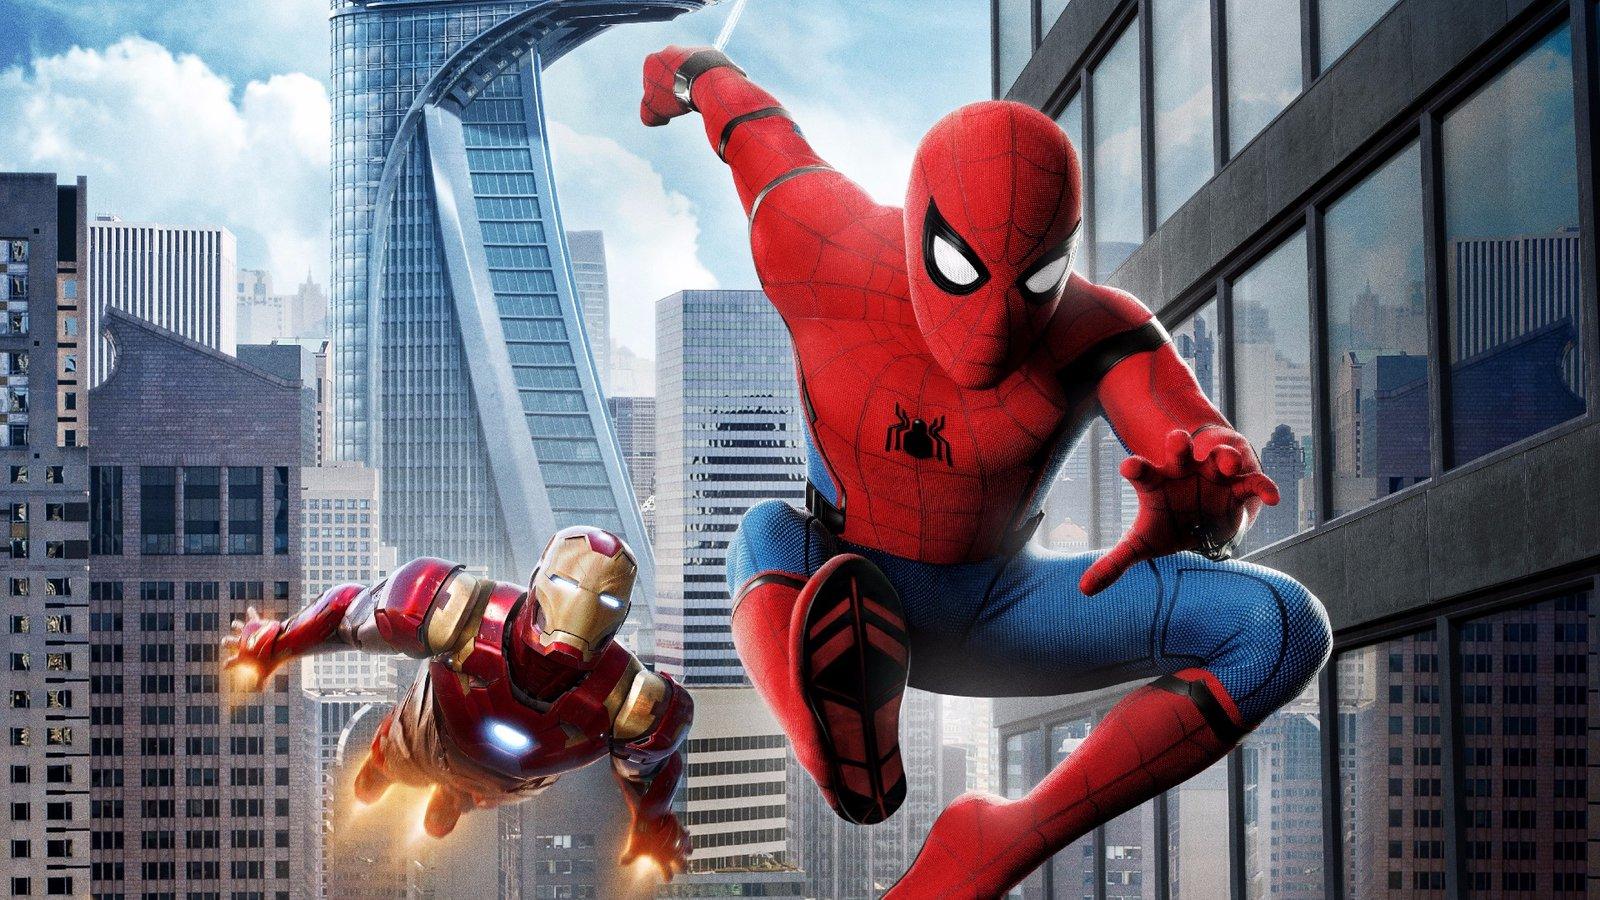 / Spider-Man: Homecoming